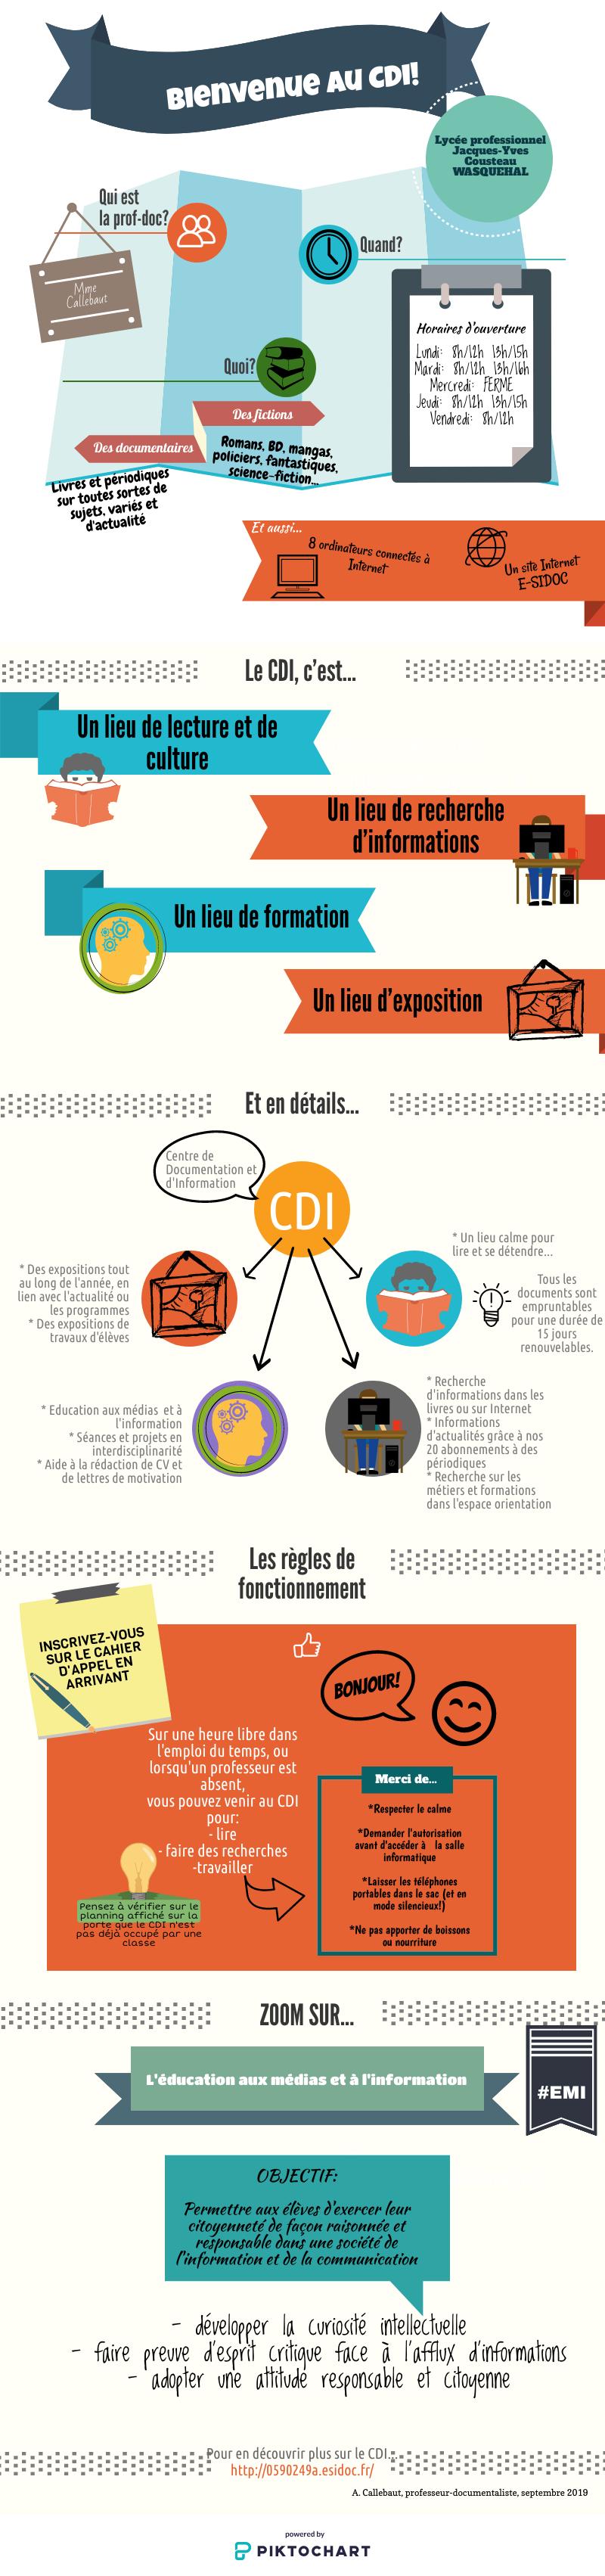 bienvenue au CDI 2019.png